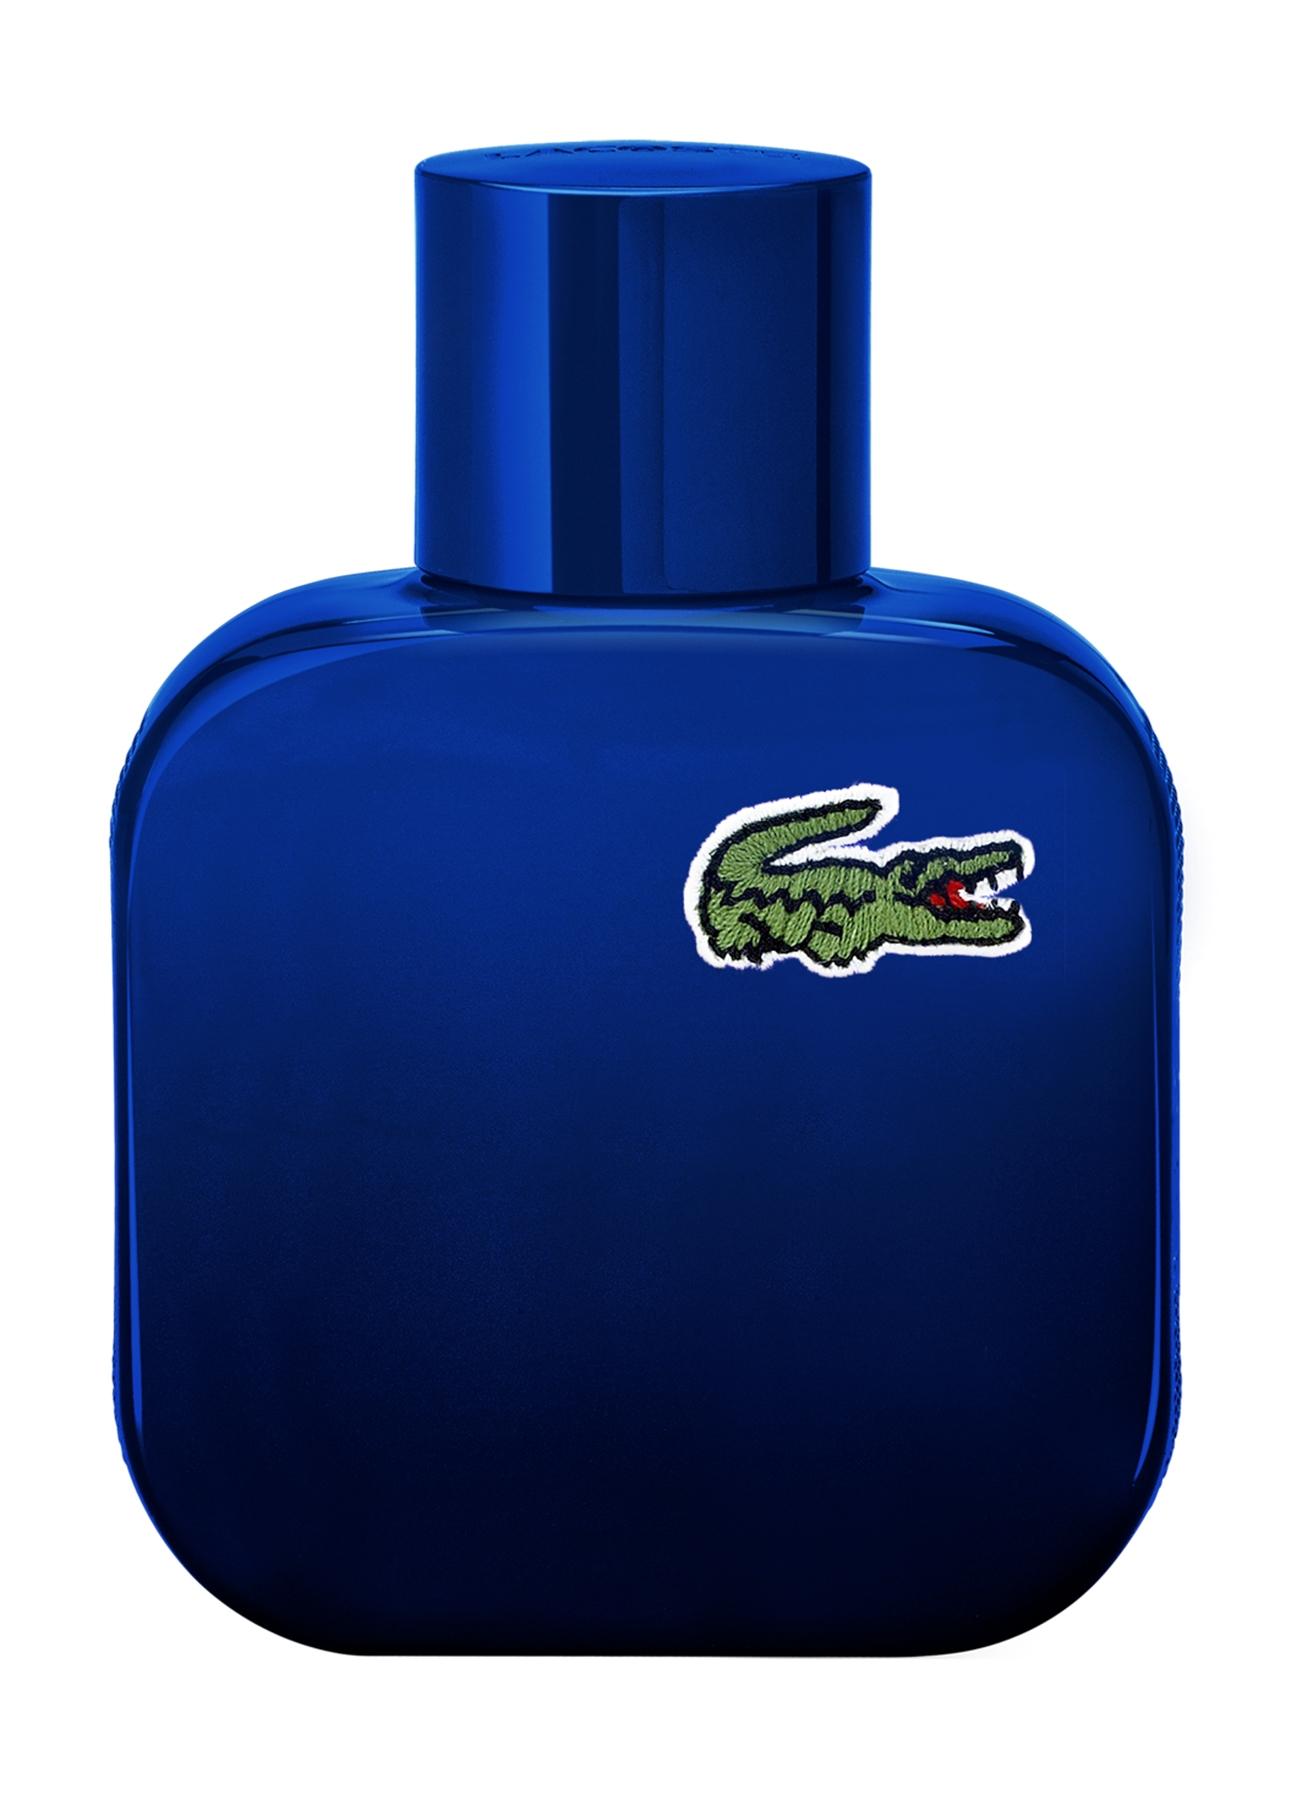 Lacoste Pour Homme Magnetic Edt 50 ml Erkek Parfüm 5000149182001 Ürün Resmi